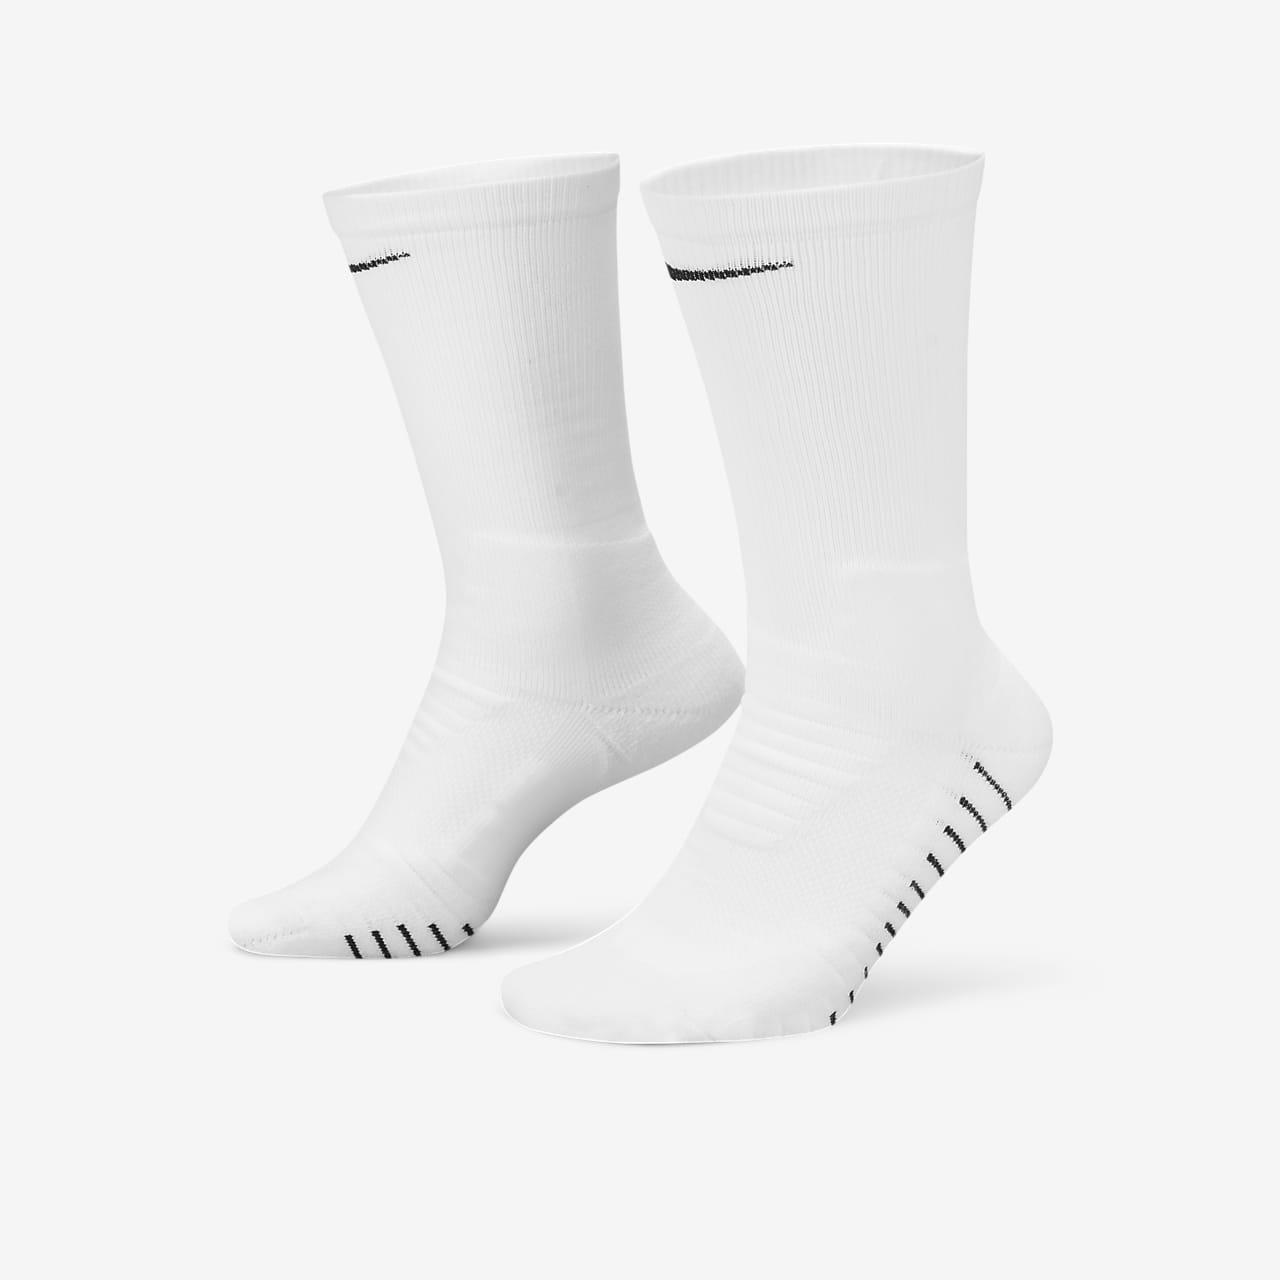 Calcetines largos de fútbol Nike Vapor